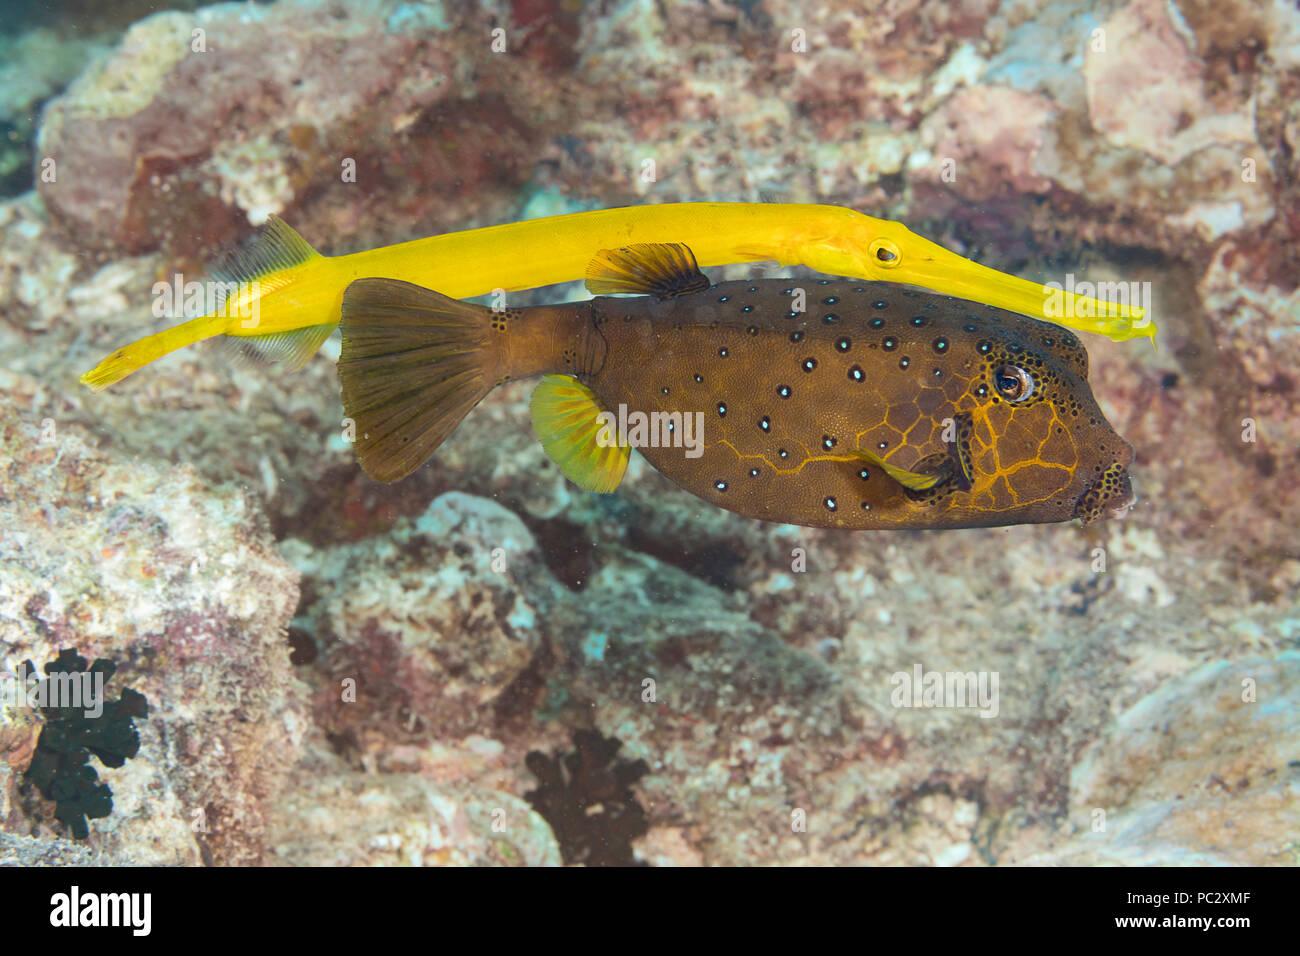 This trumpetfish, Aulostomus maculatus, a reef predator is swimming behind a yellow boxfish, Ostracion cubicus, using it as a blind to ambush prey, Ya - Stock Image